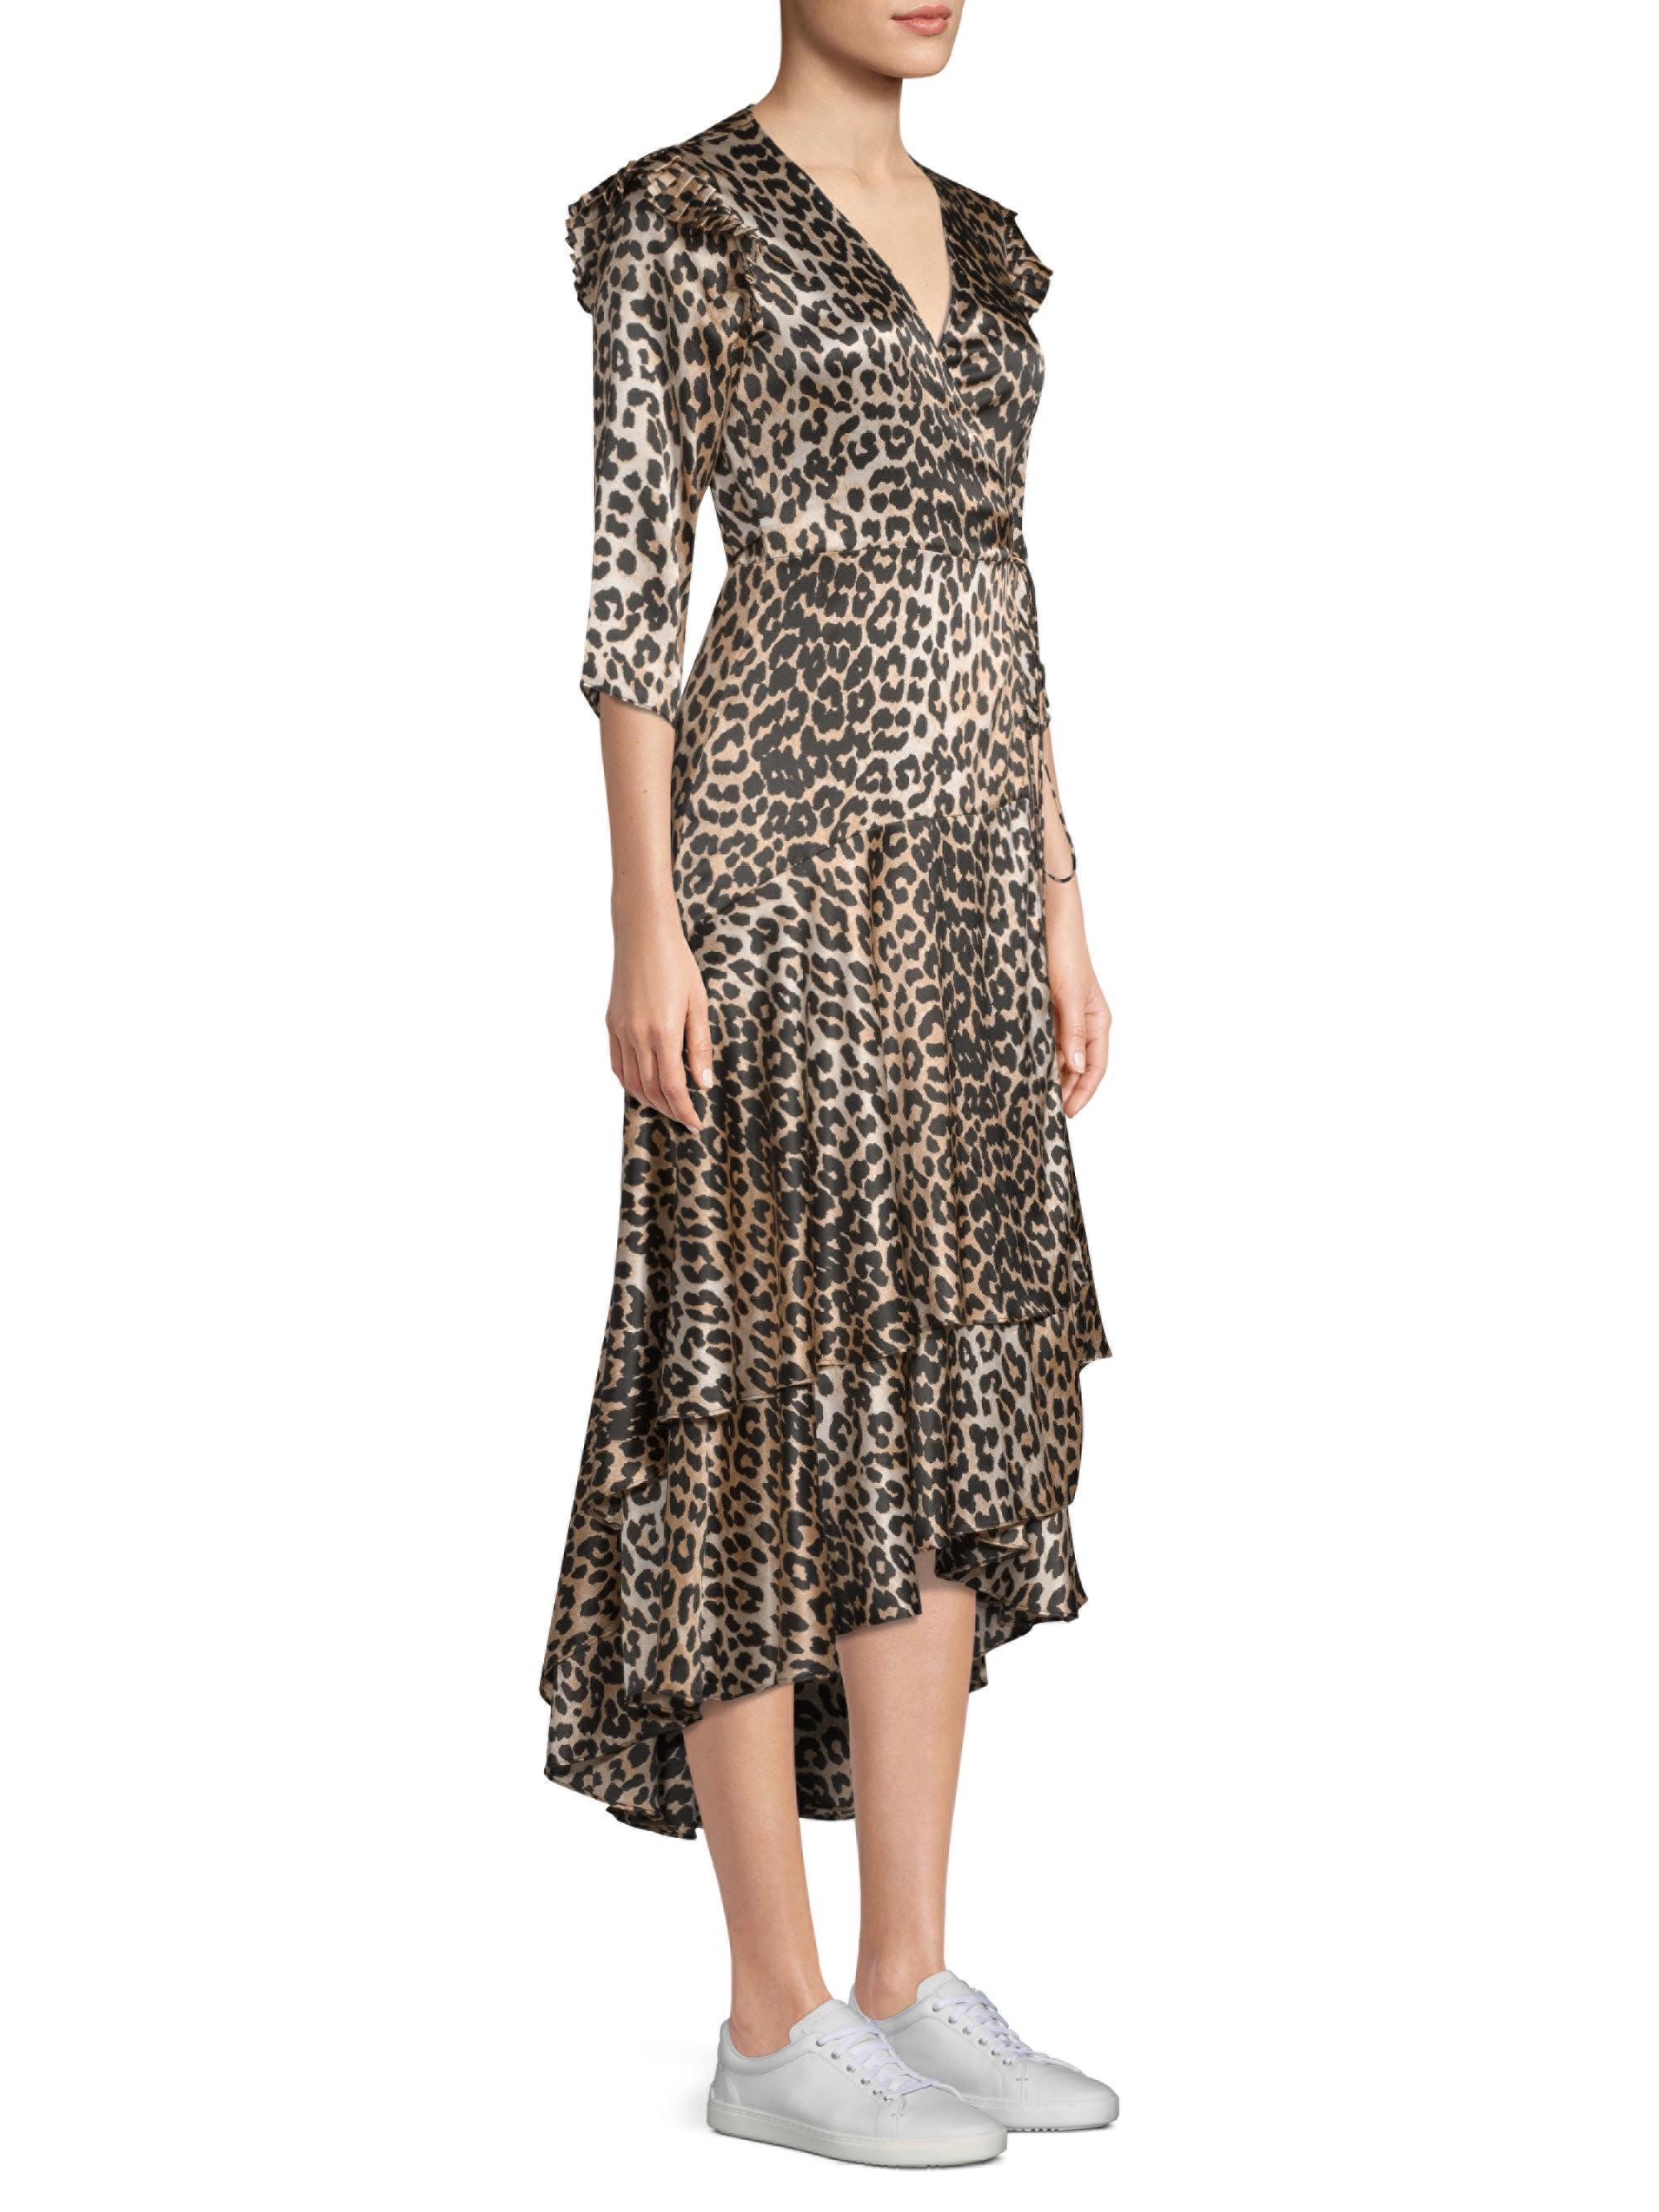 66d9390abf8 Ganni Calla Leopard Silk Dress - 40 (8) in 2019 | Products | Silk ...